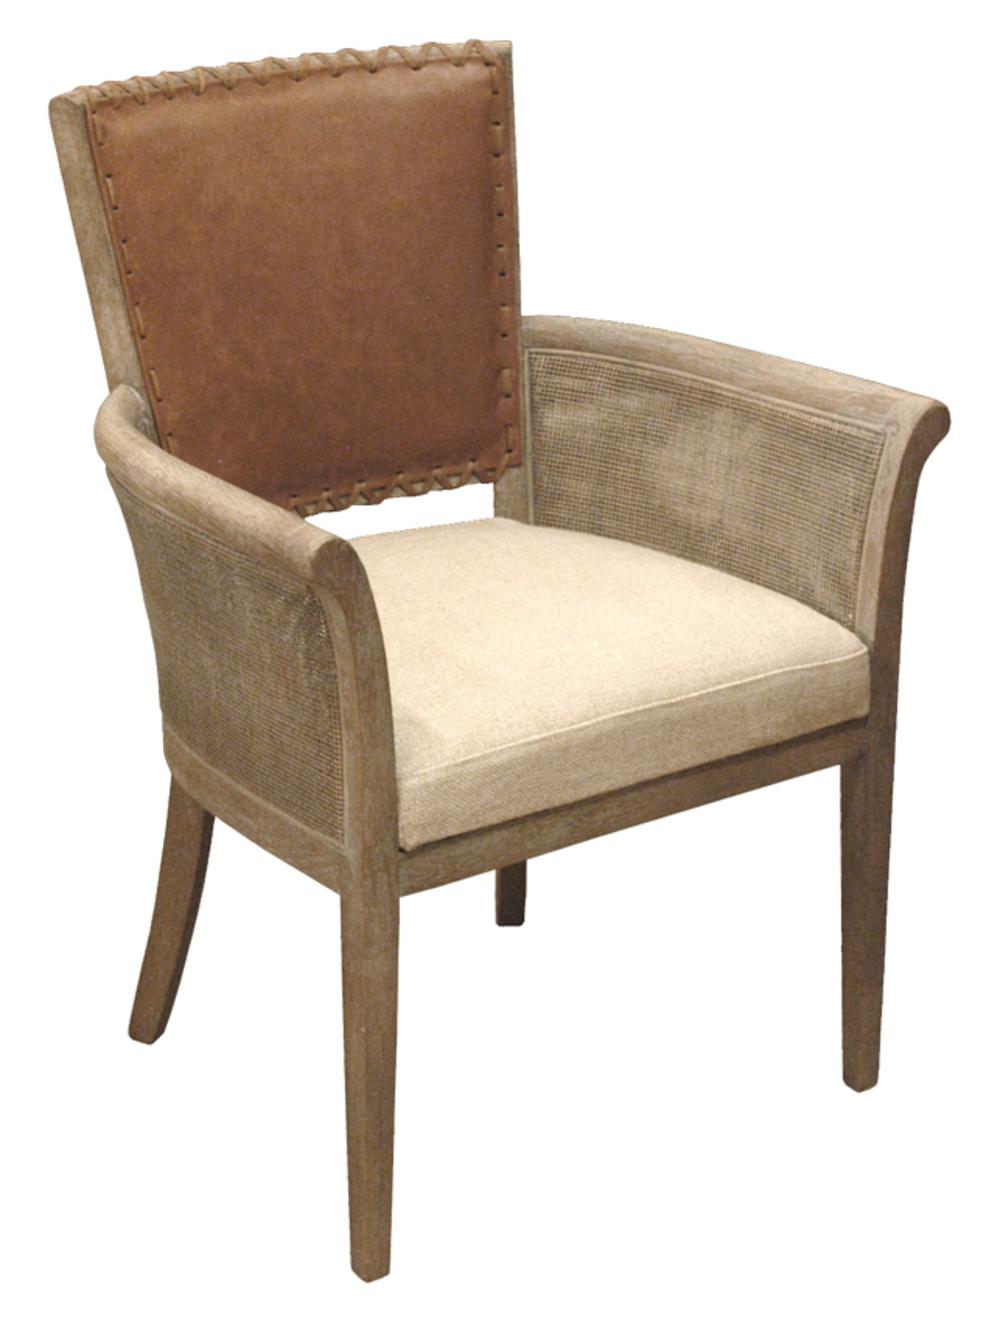 GJ Styles - Garcia Chair